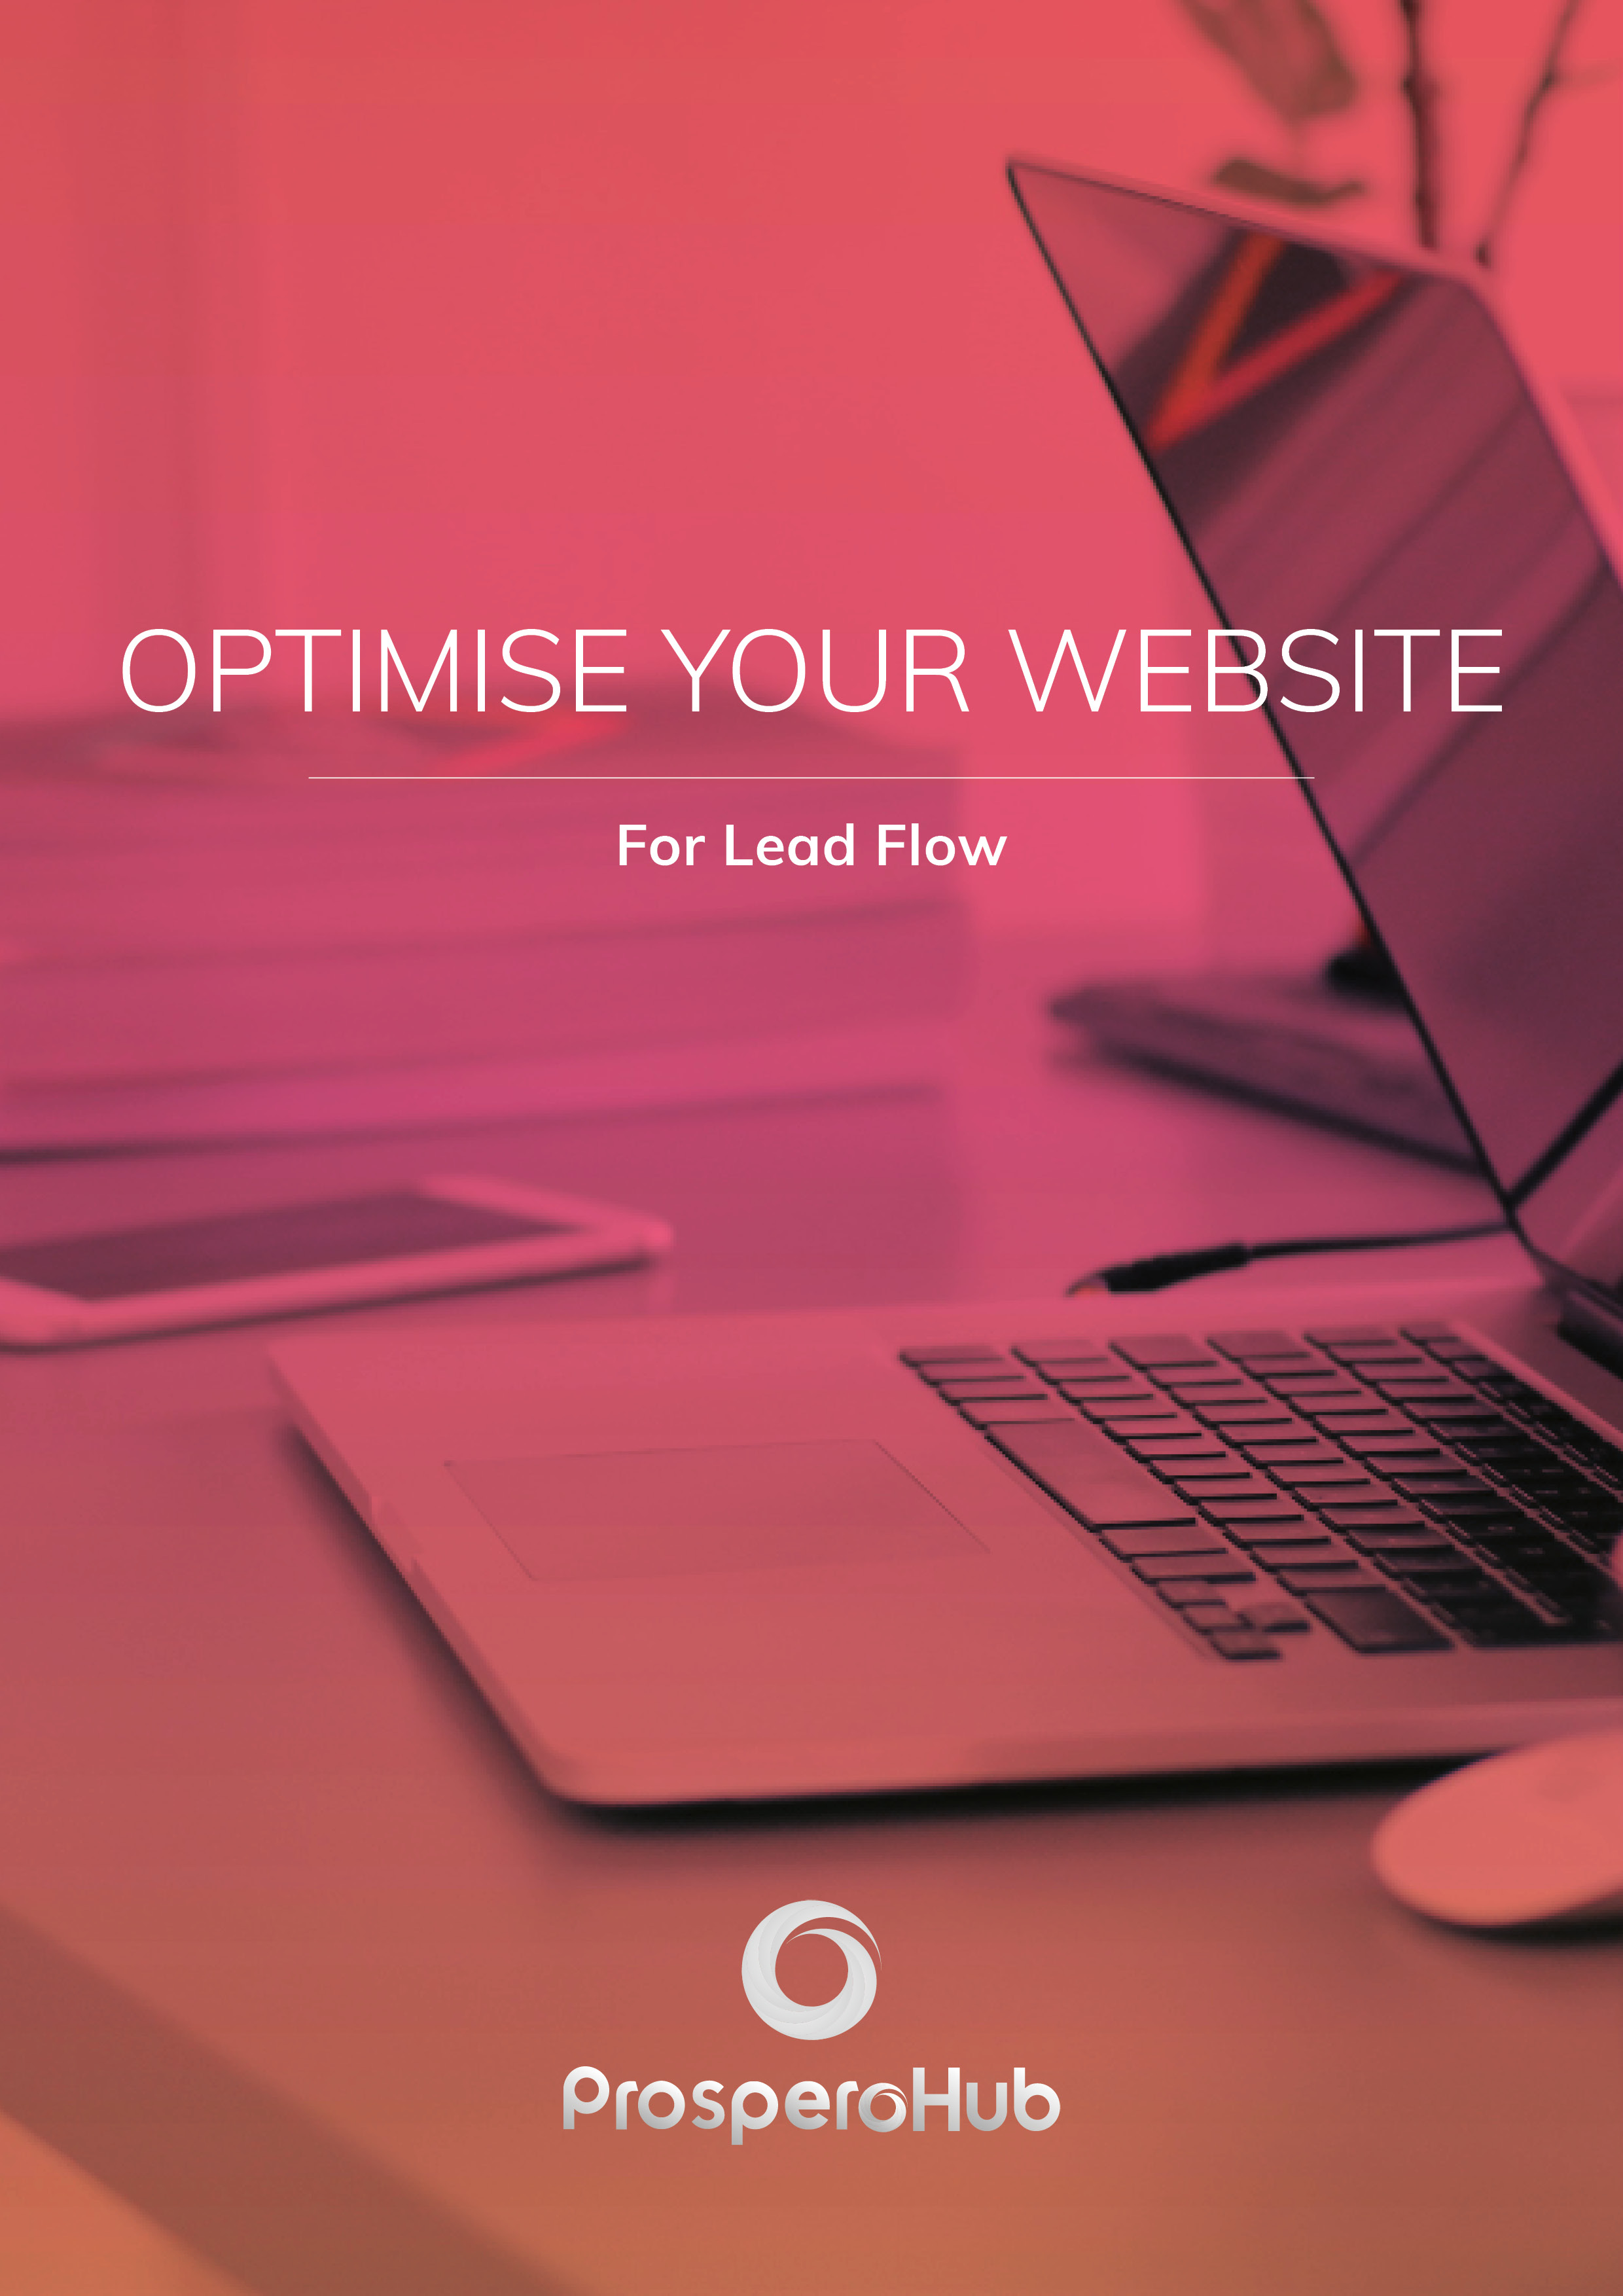 ProsperoHub - Optimise Your Website for Lead Flow